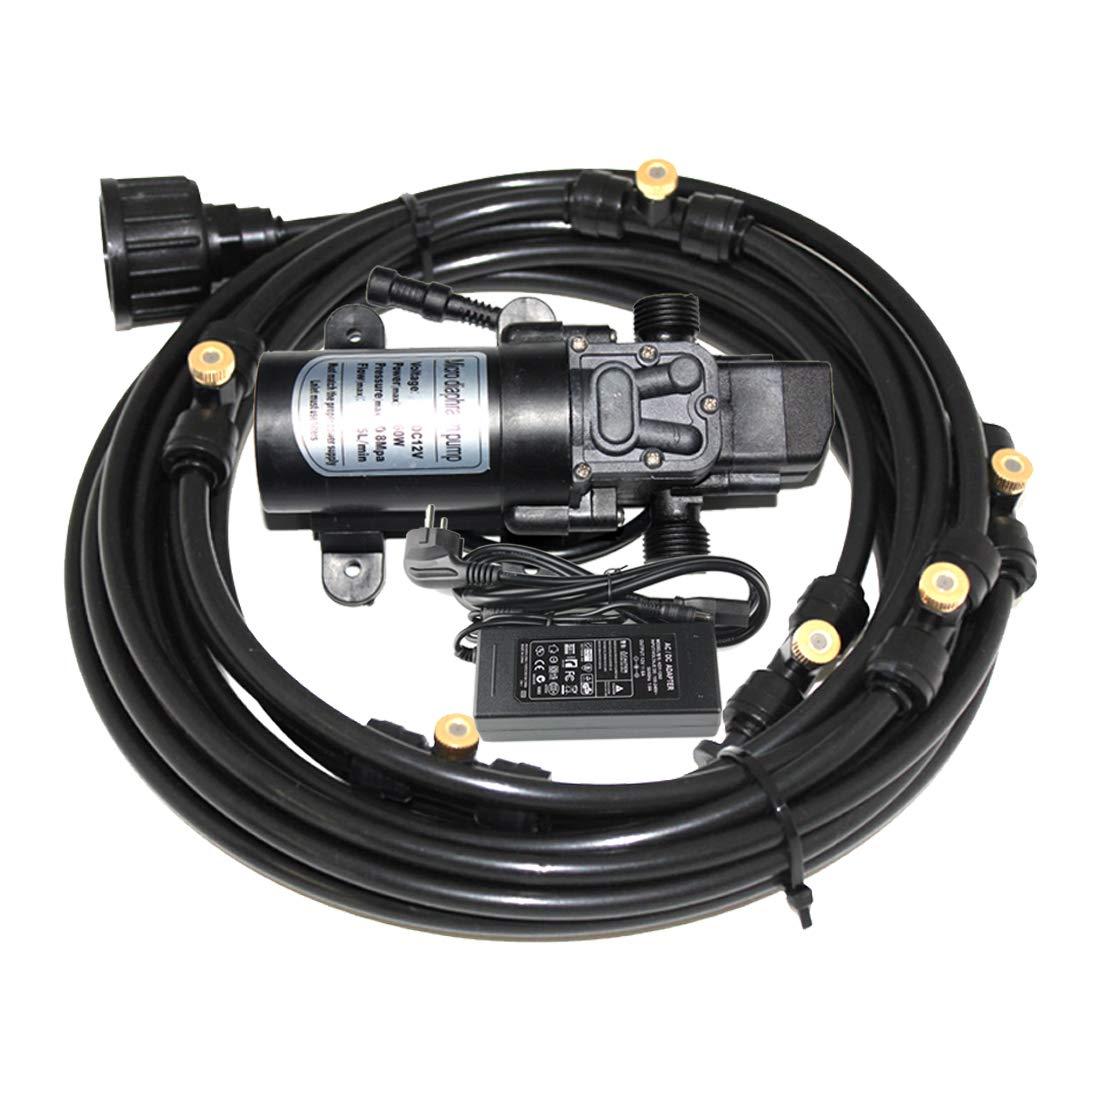 Redaiyuling 12V 60W 5L/min High Pressure Water Self Priming Micro Sprayer Diaphragm Misting System Pump, with 20feet Length 12V DC Mist System Kit, for RV Camper Marine Boat Lawn by Redaiyuling